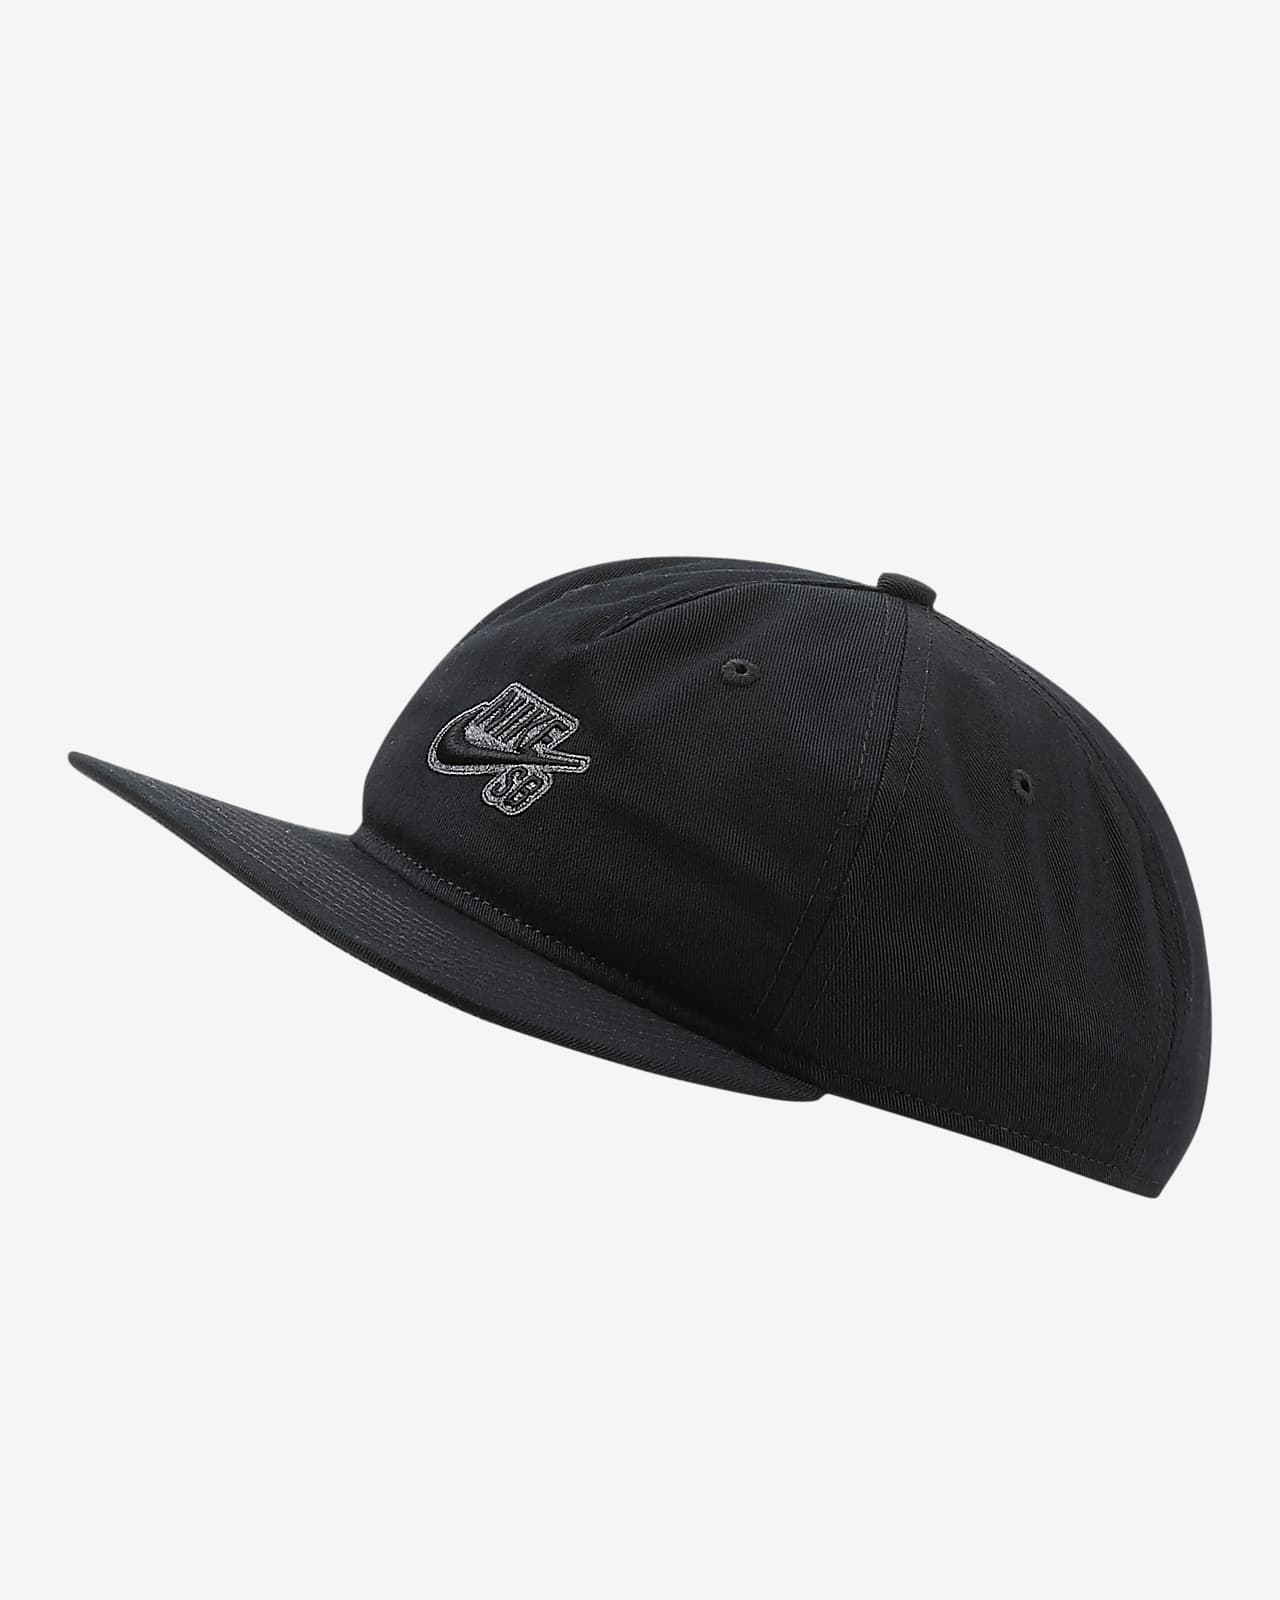 Nike SB AW84 Skate Cap. Nike FI